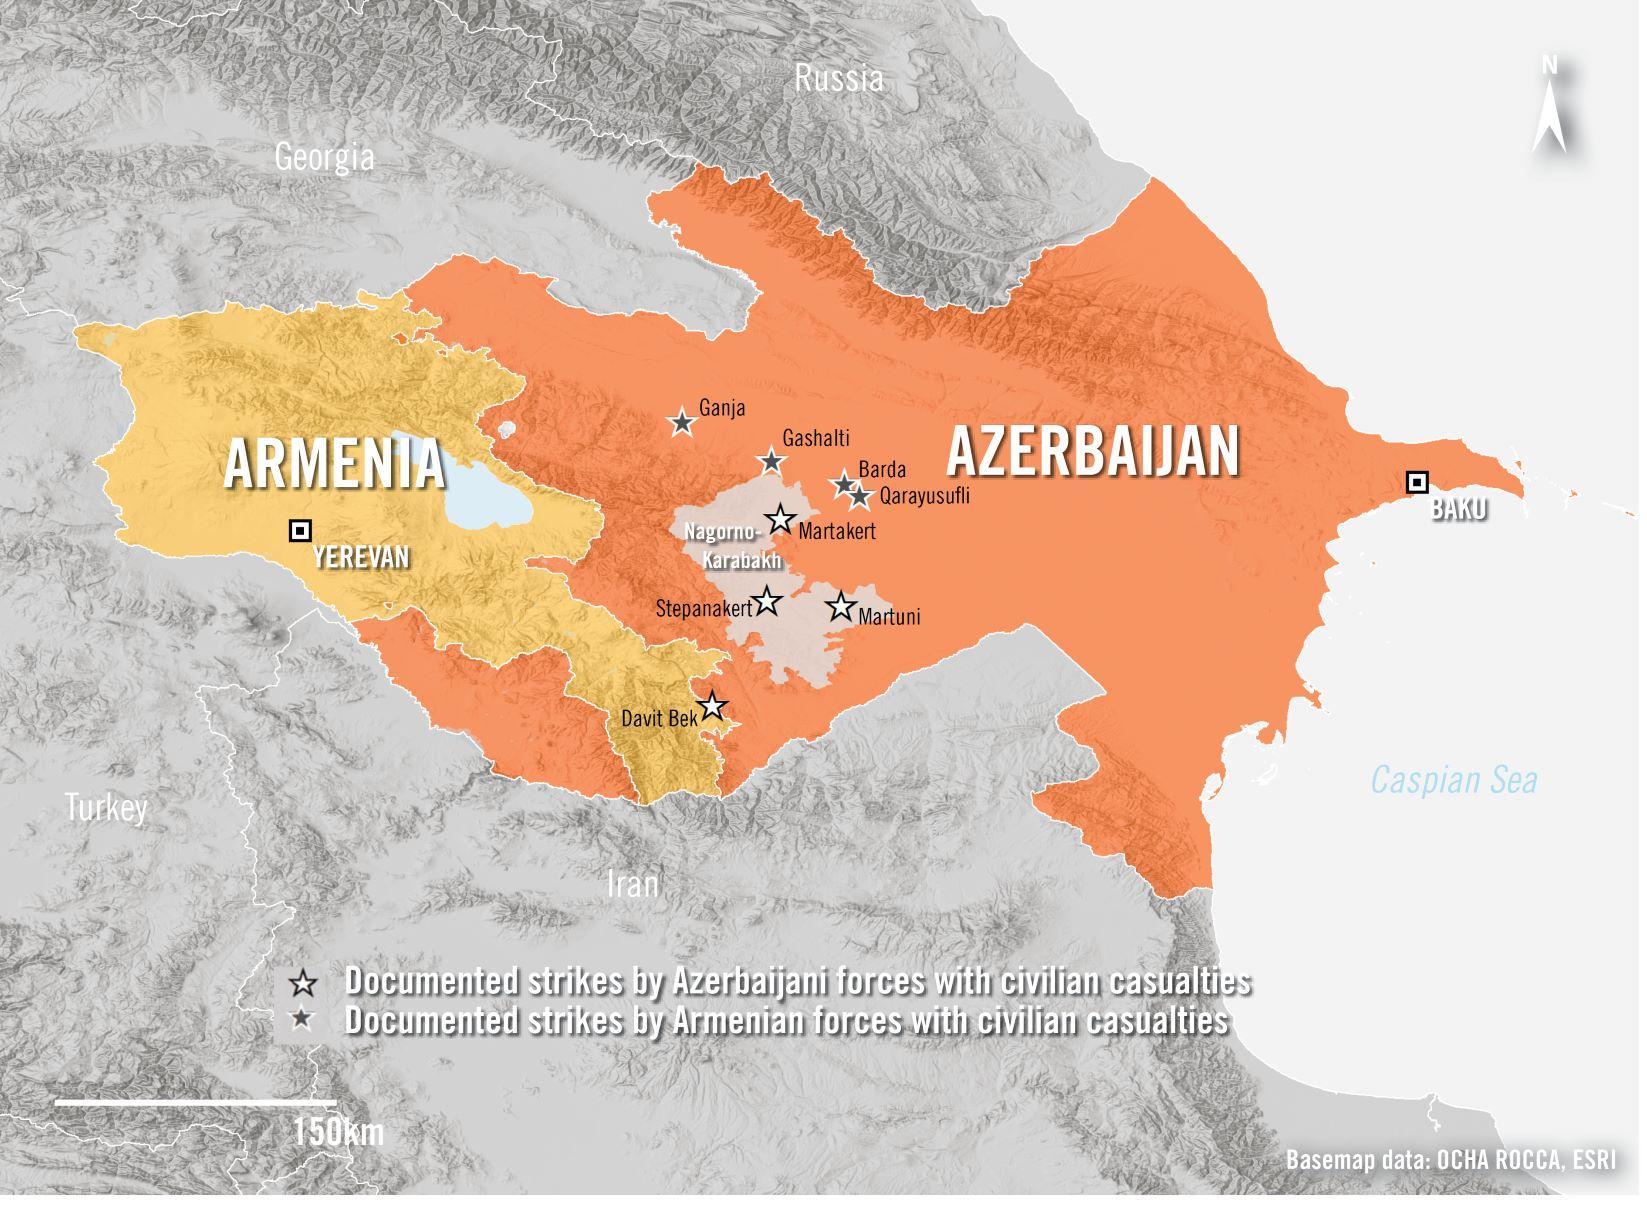 © Karte: Basemap data: OCHA, ROCCA, ESRI; Satellitenbild: Image: Google Earth © Maxar Technologies